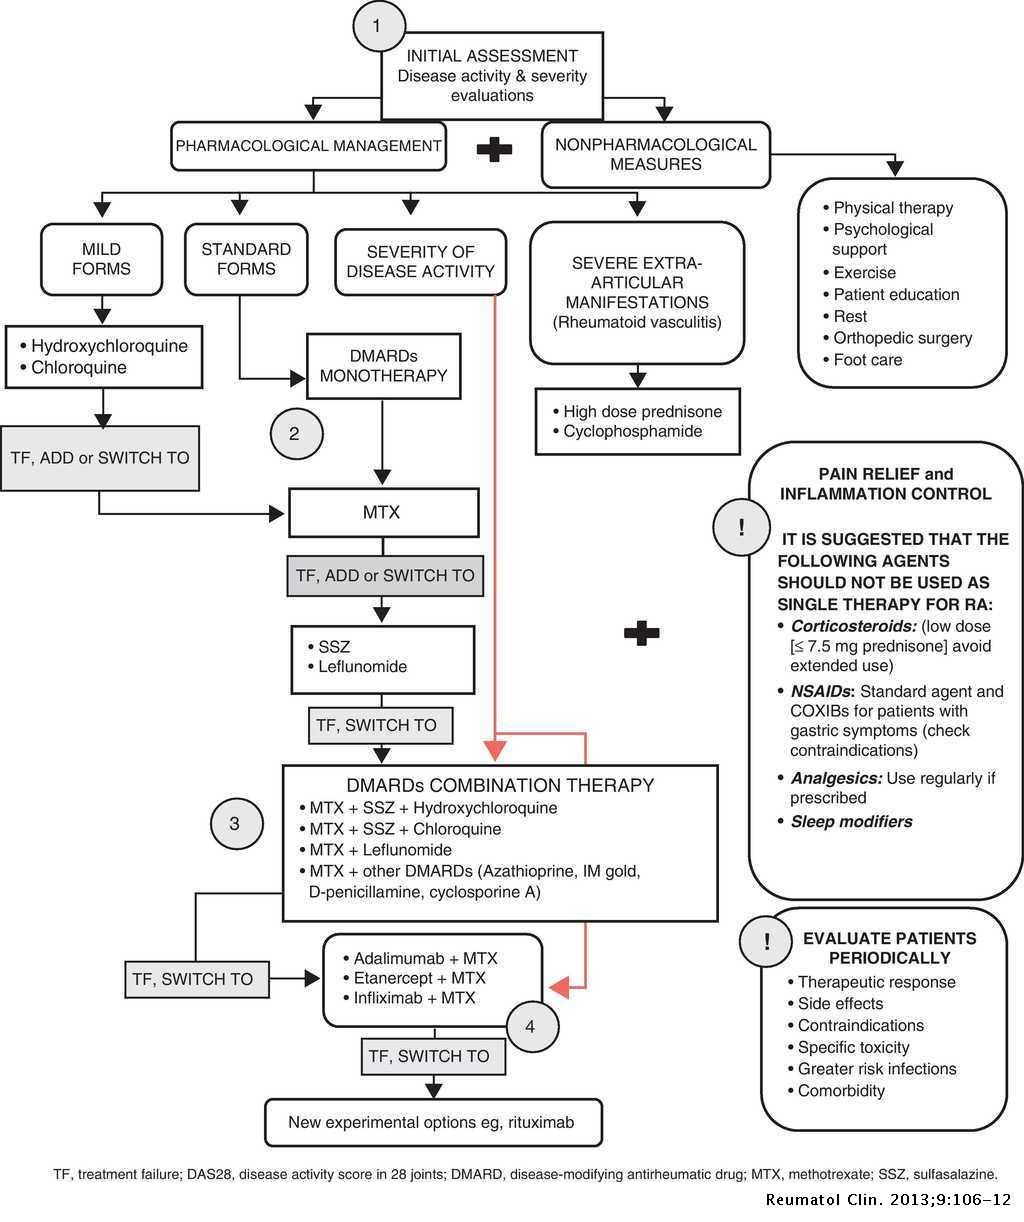 Current therapies in rheumatoid arthritis: A Latin American